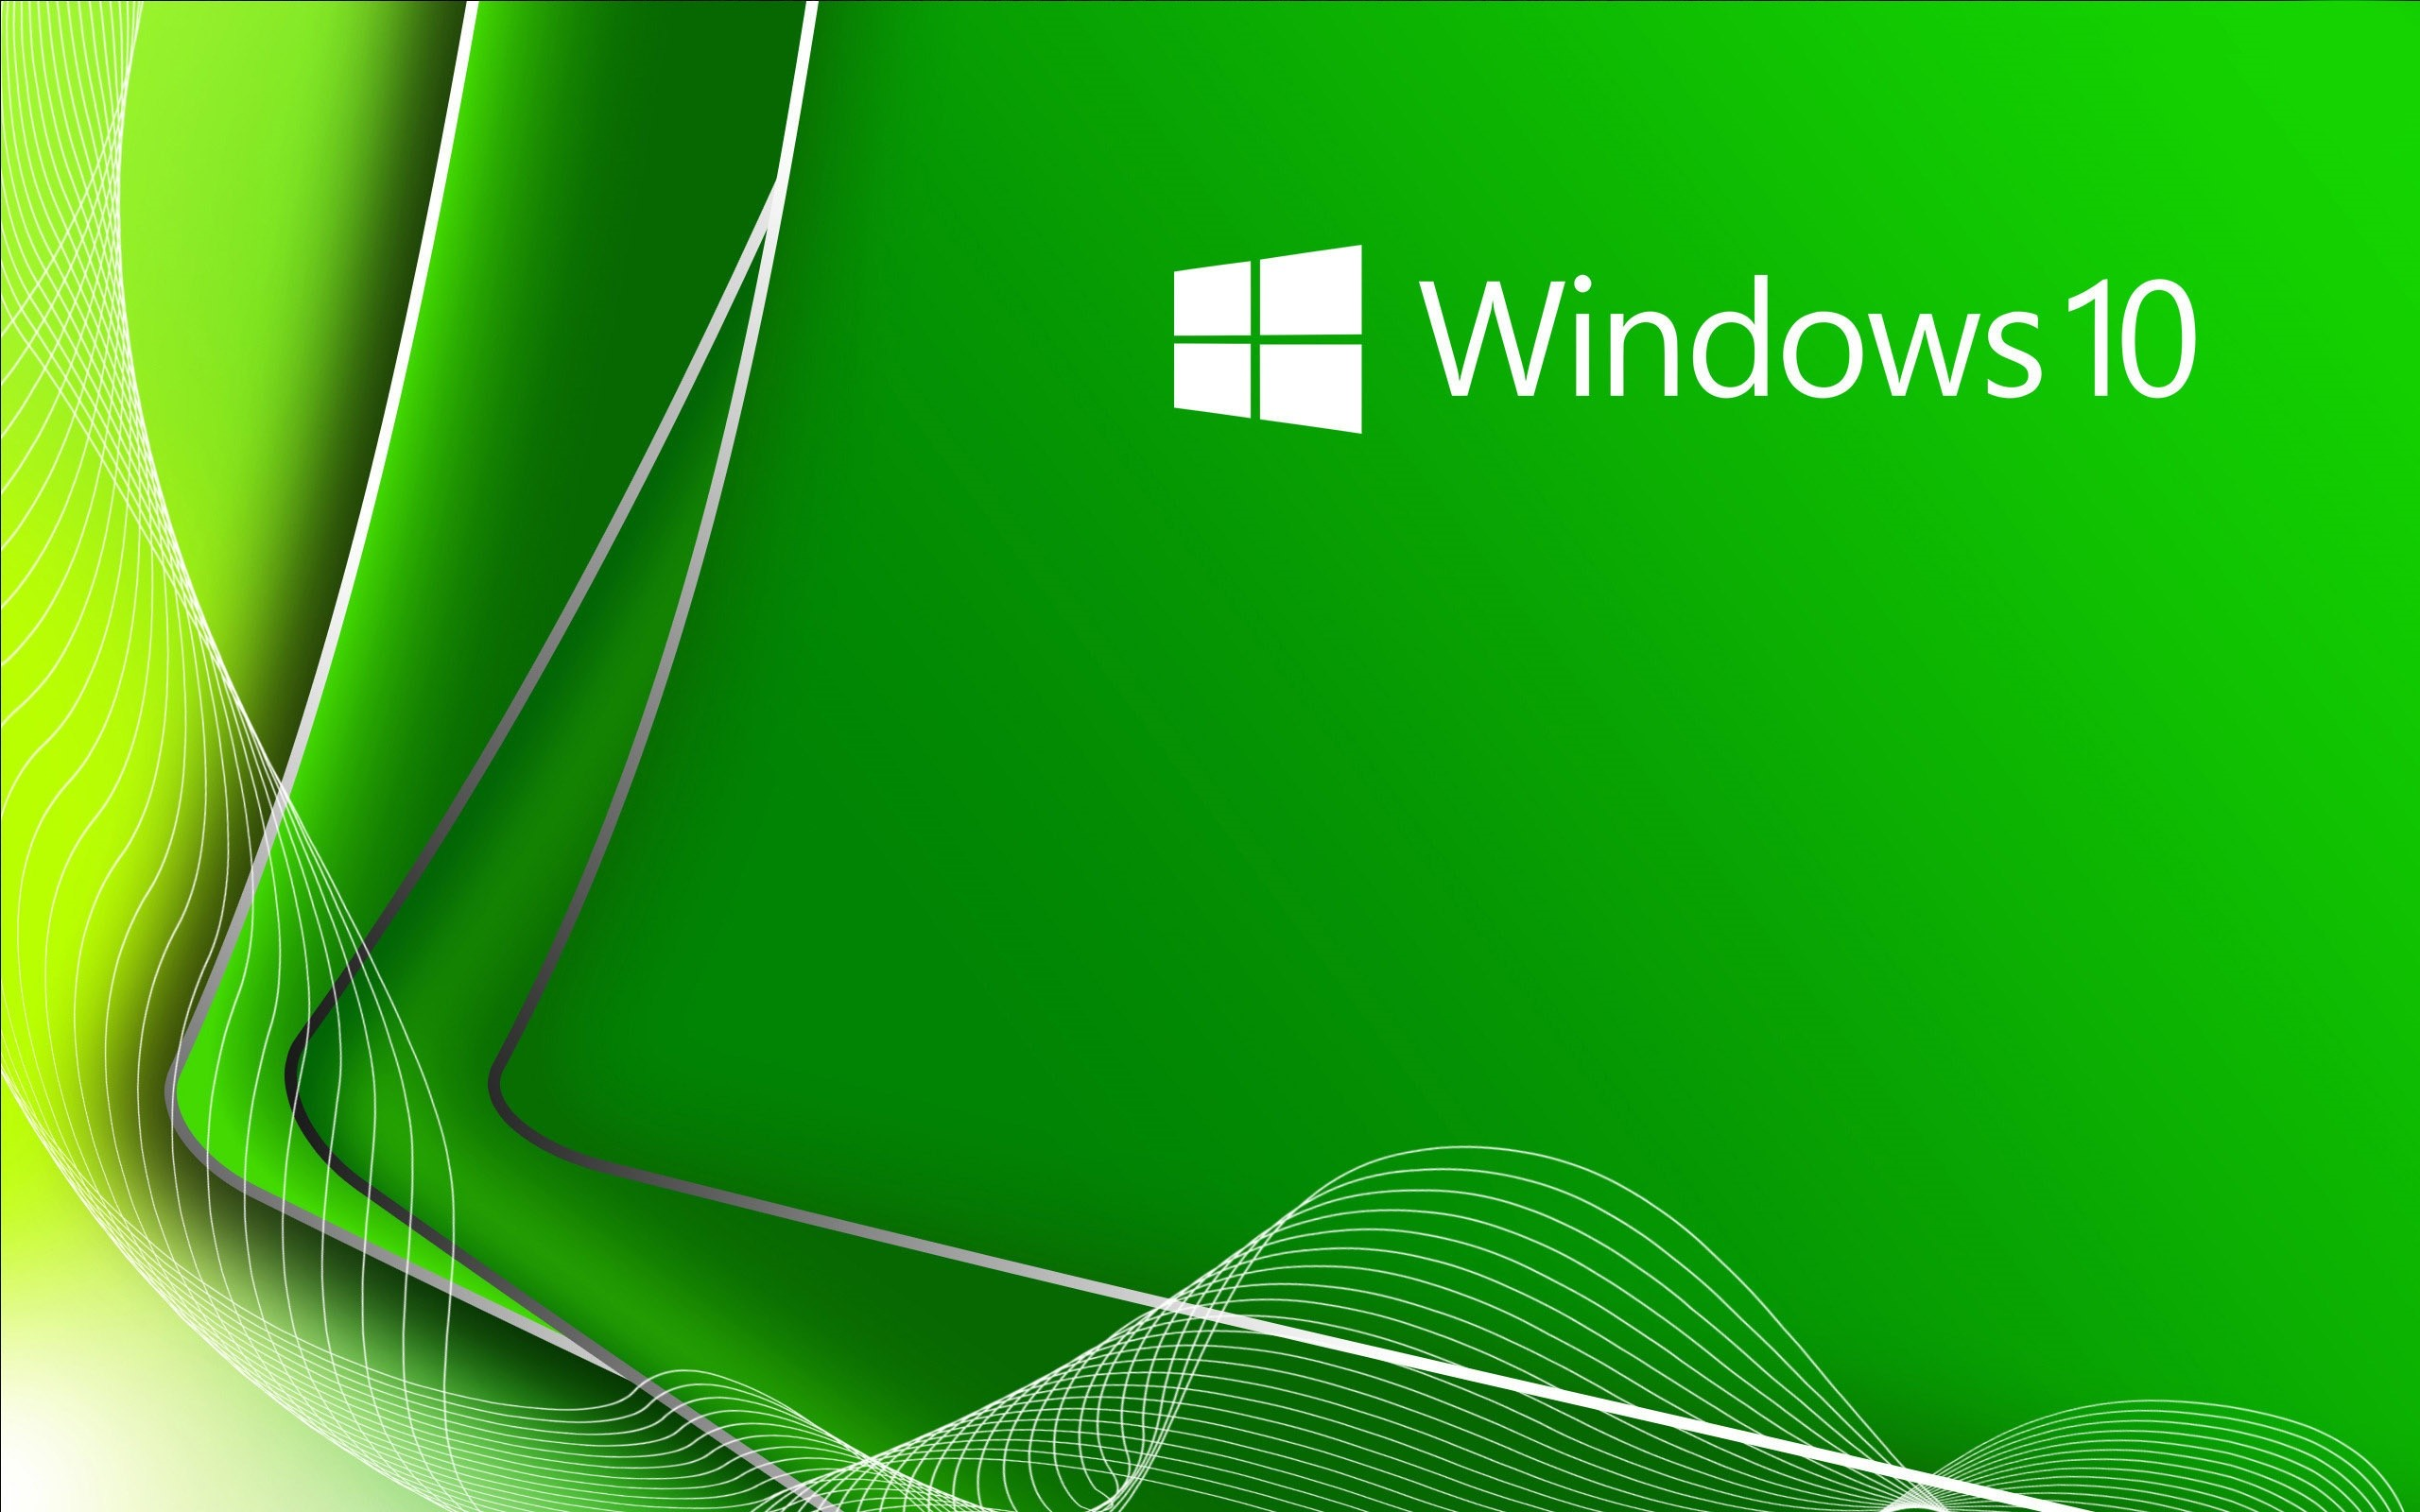 Windows 10 – Green wallpaper 1920×1080 | Landscape – Tájkép – Photography –  Fotógráfia | Pinterest | Green wallpaper and Windows 10